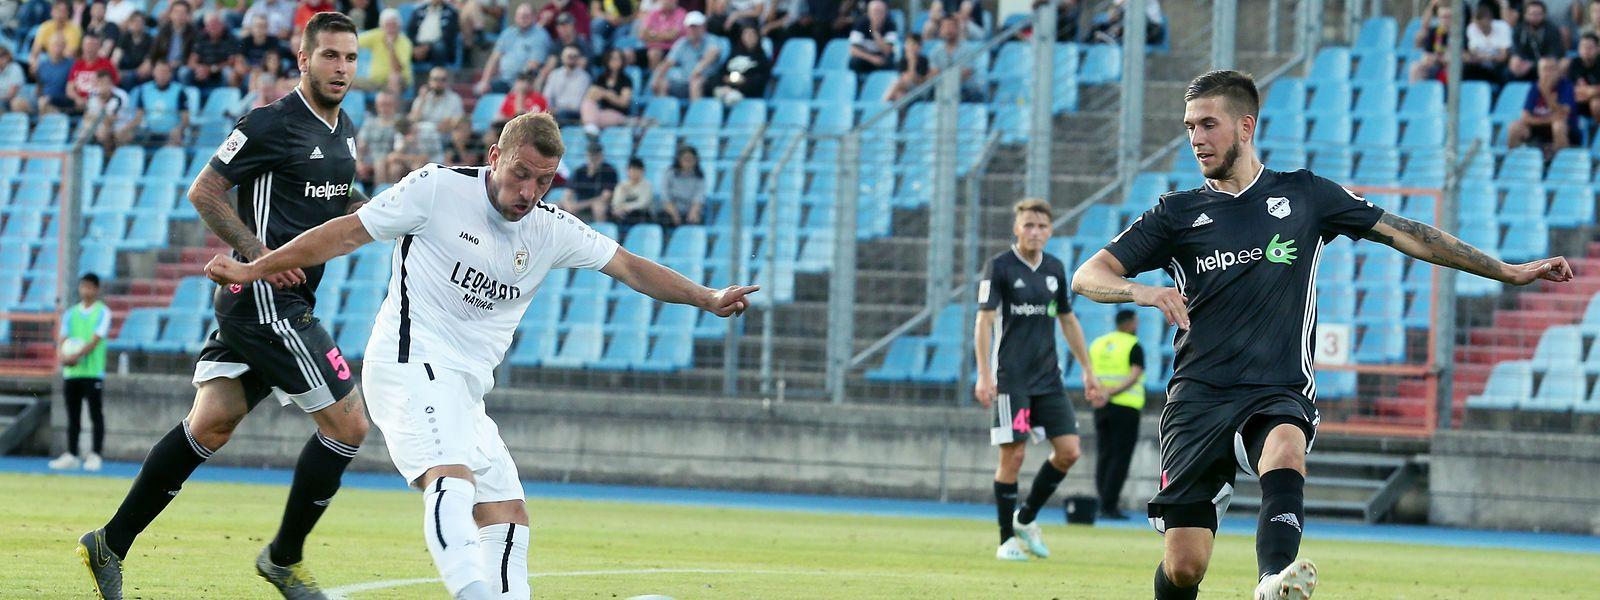 Dominik Stolz (de branco) fez o seu primeiro 'hat-trick' na Liga Europa frente ao Kalju.